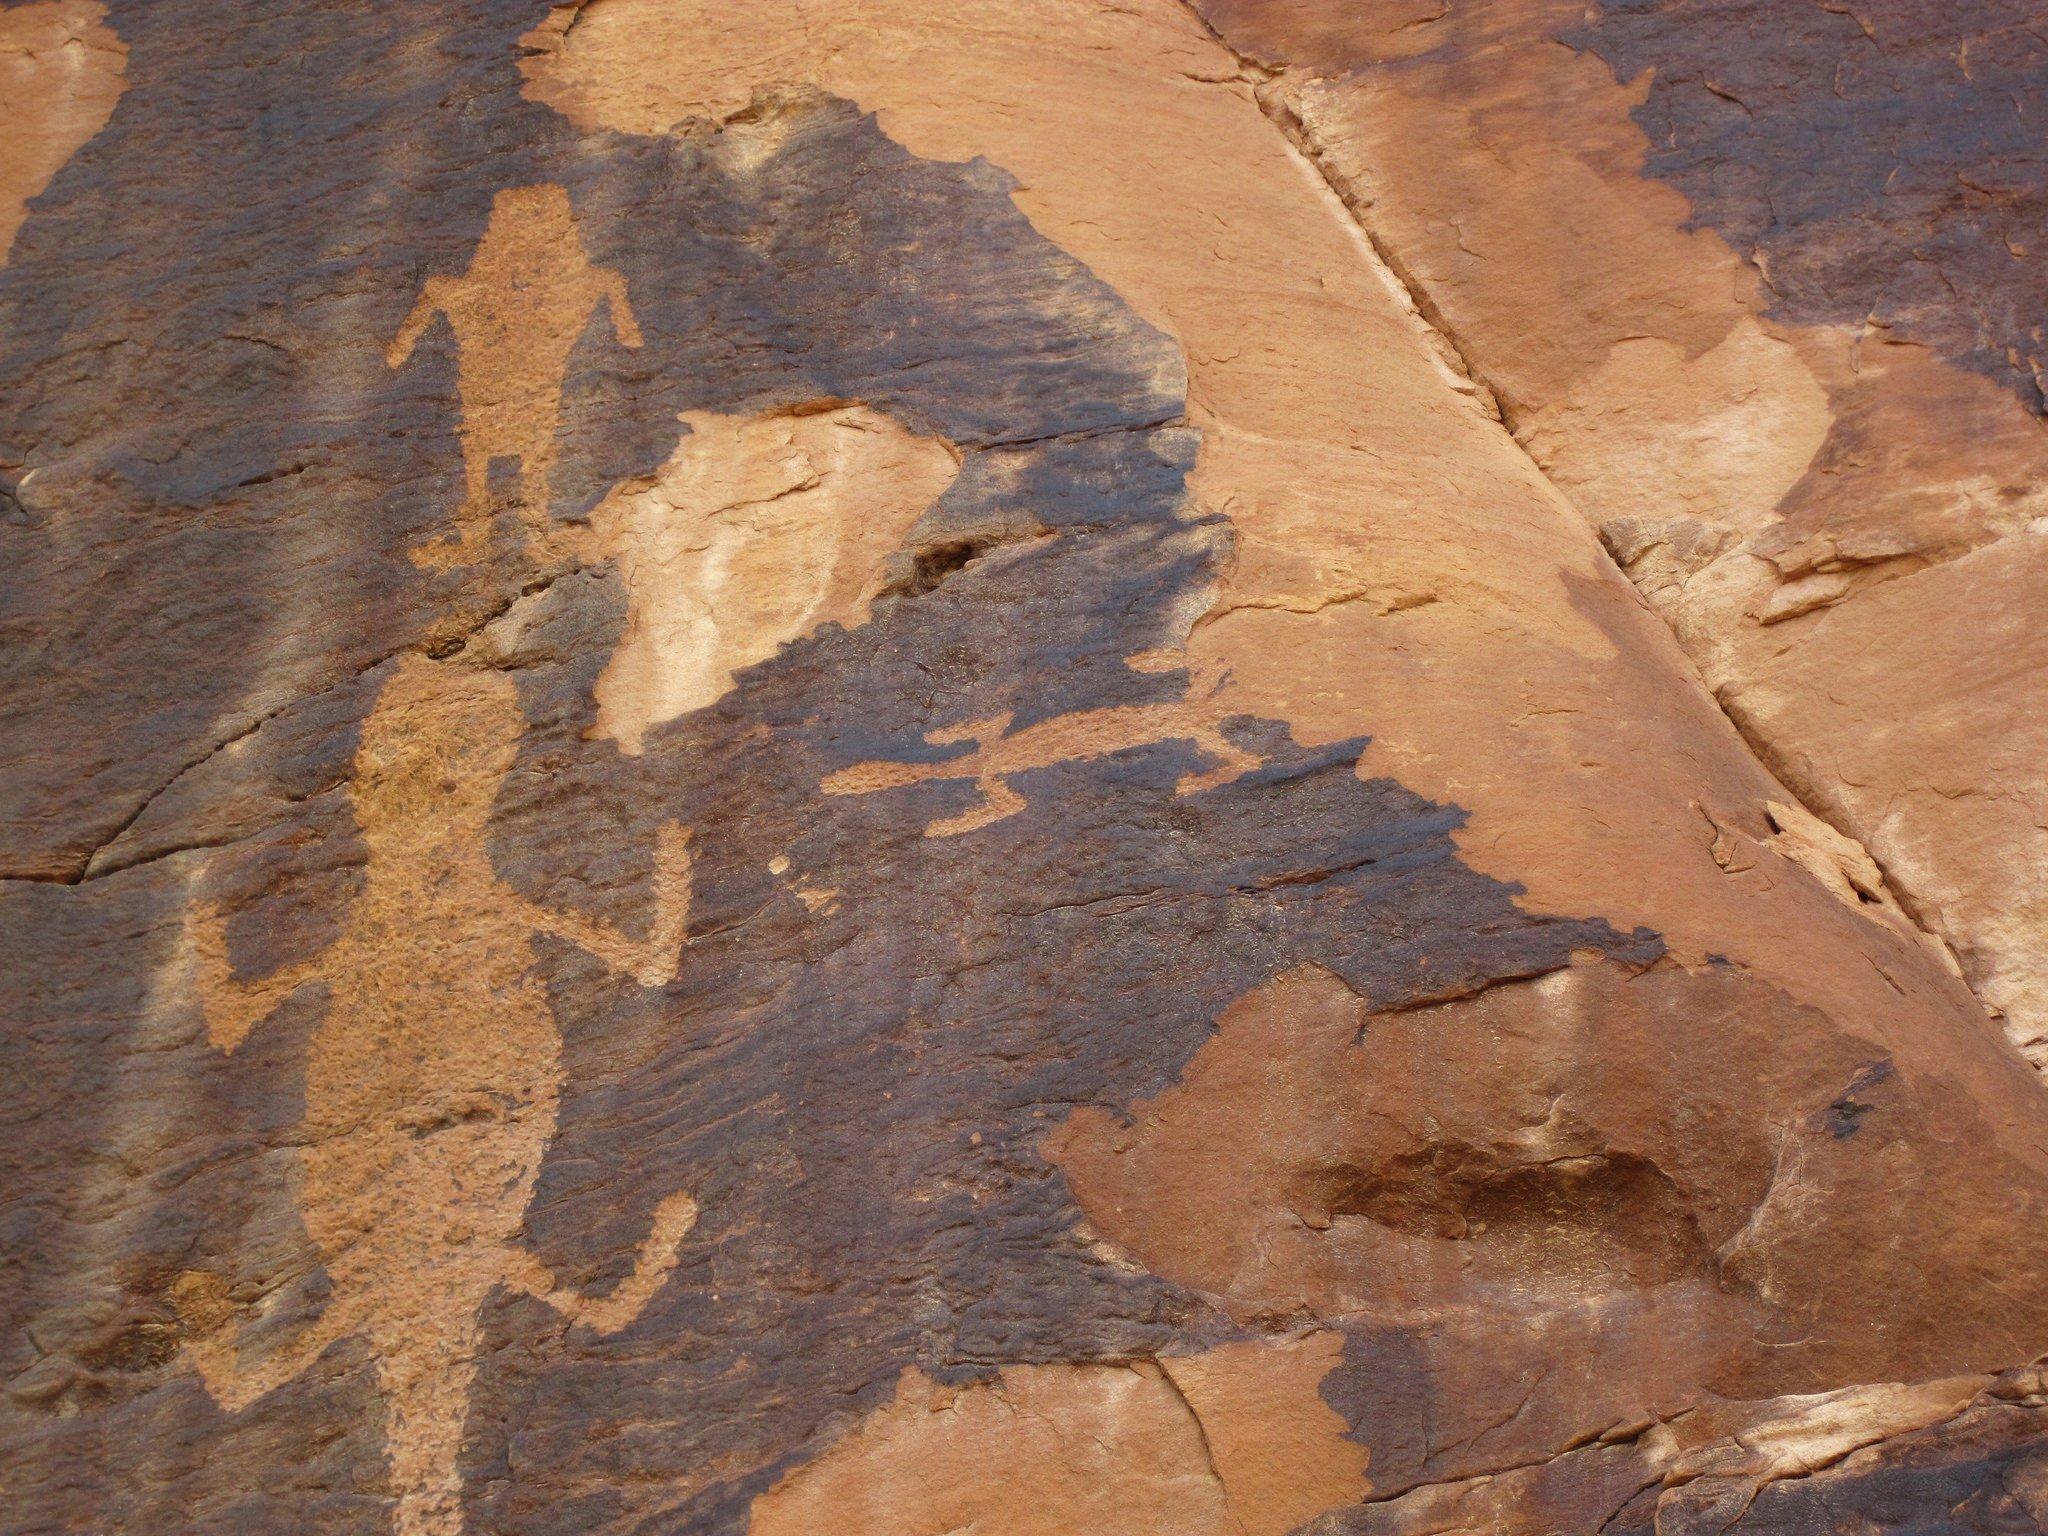 indian petroglyphs at dinosaur national monument